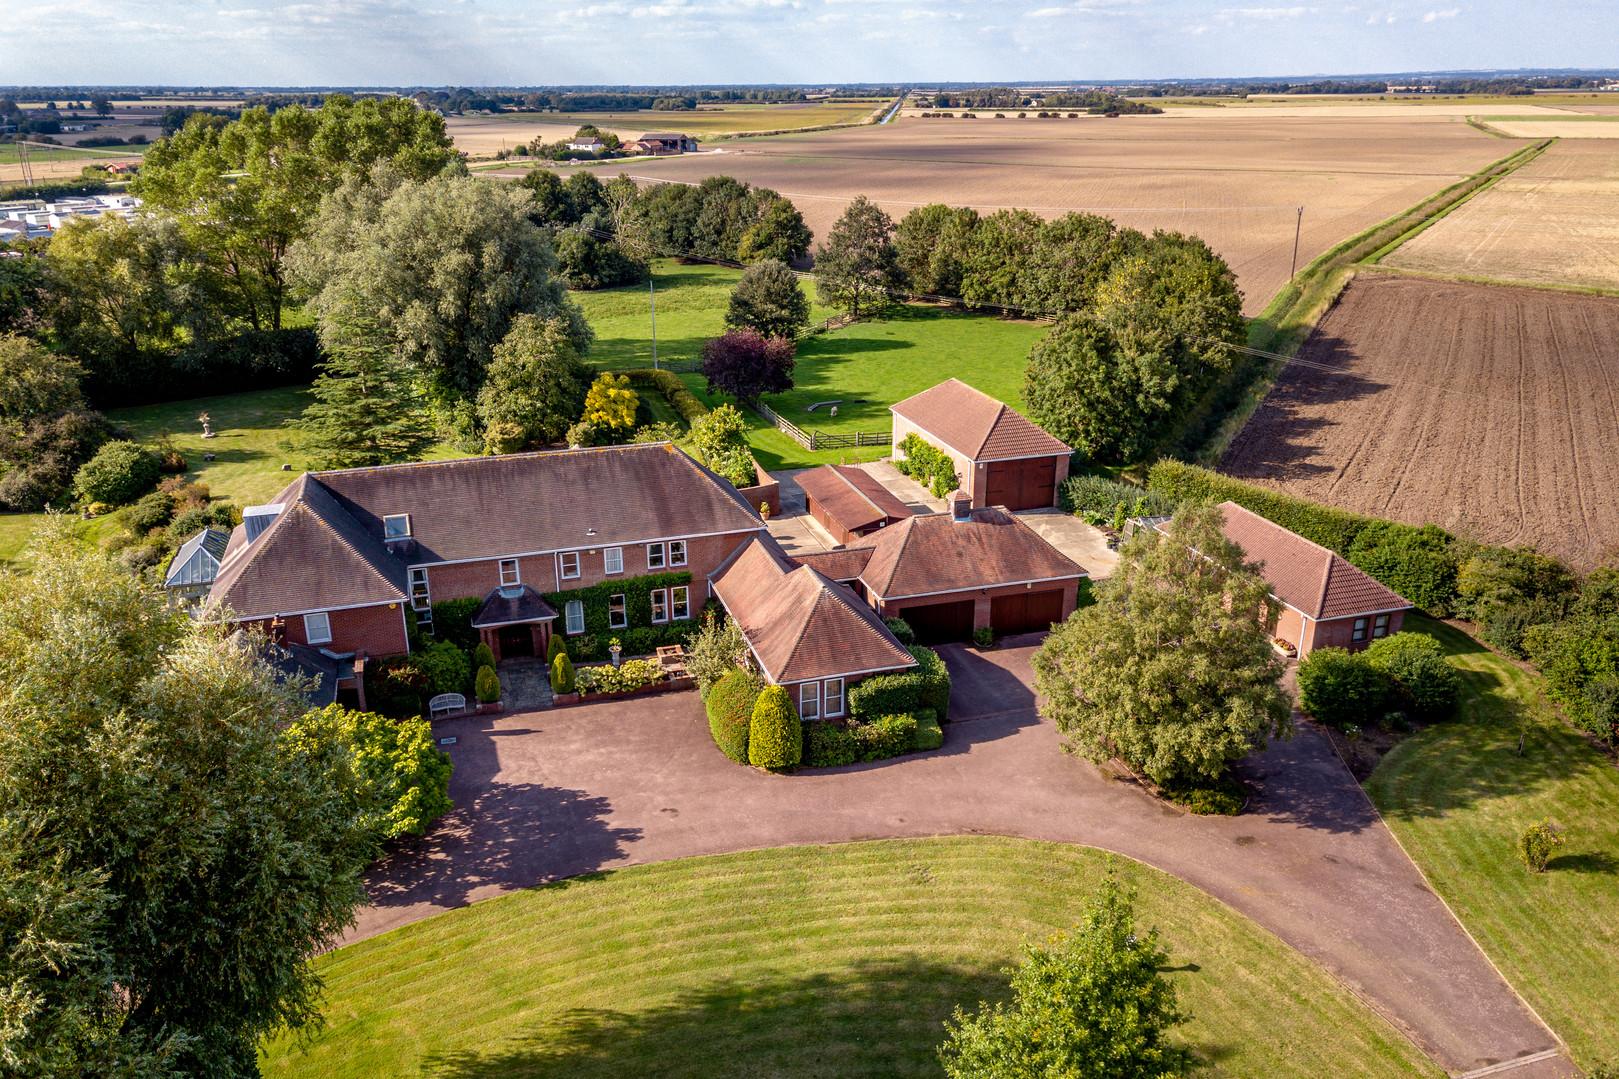 Holland House (Antons Gowt) Aerial-3.jpg